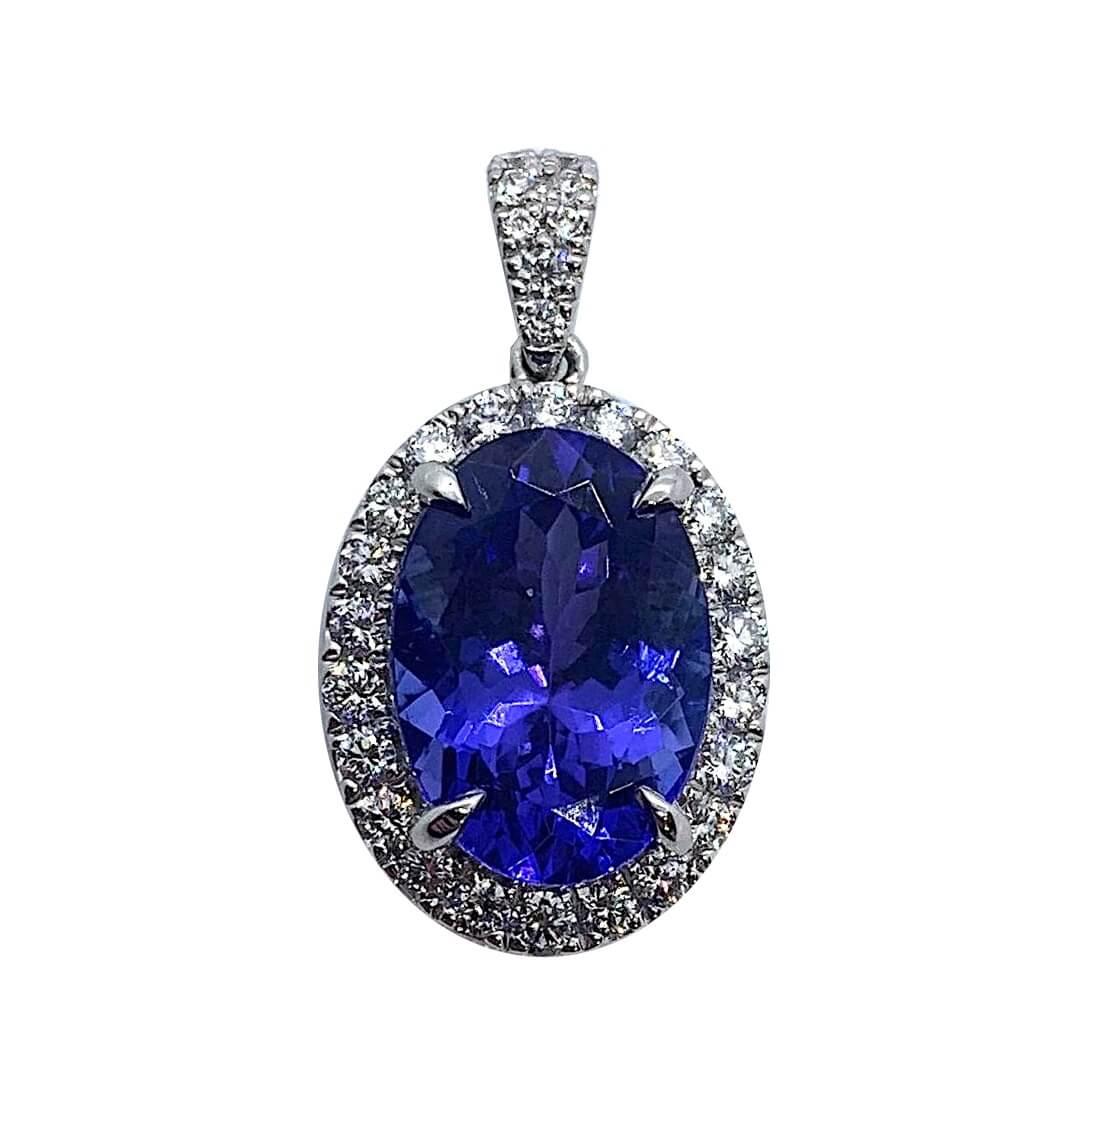 An 18ct white gold, tanzanite and diamond pendant